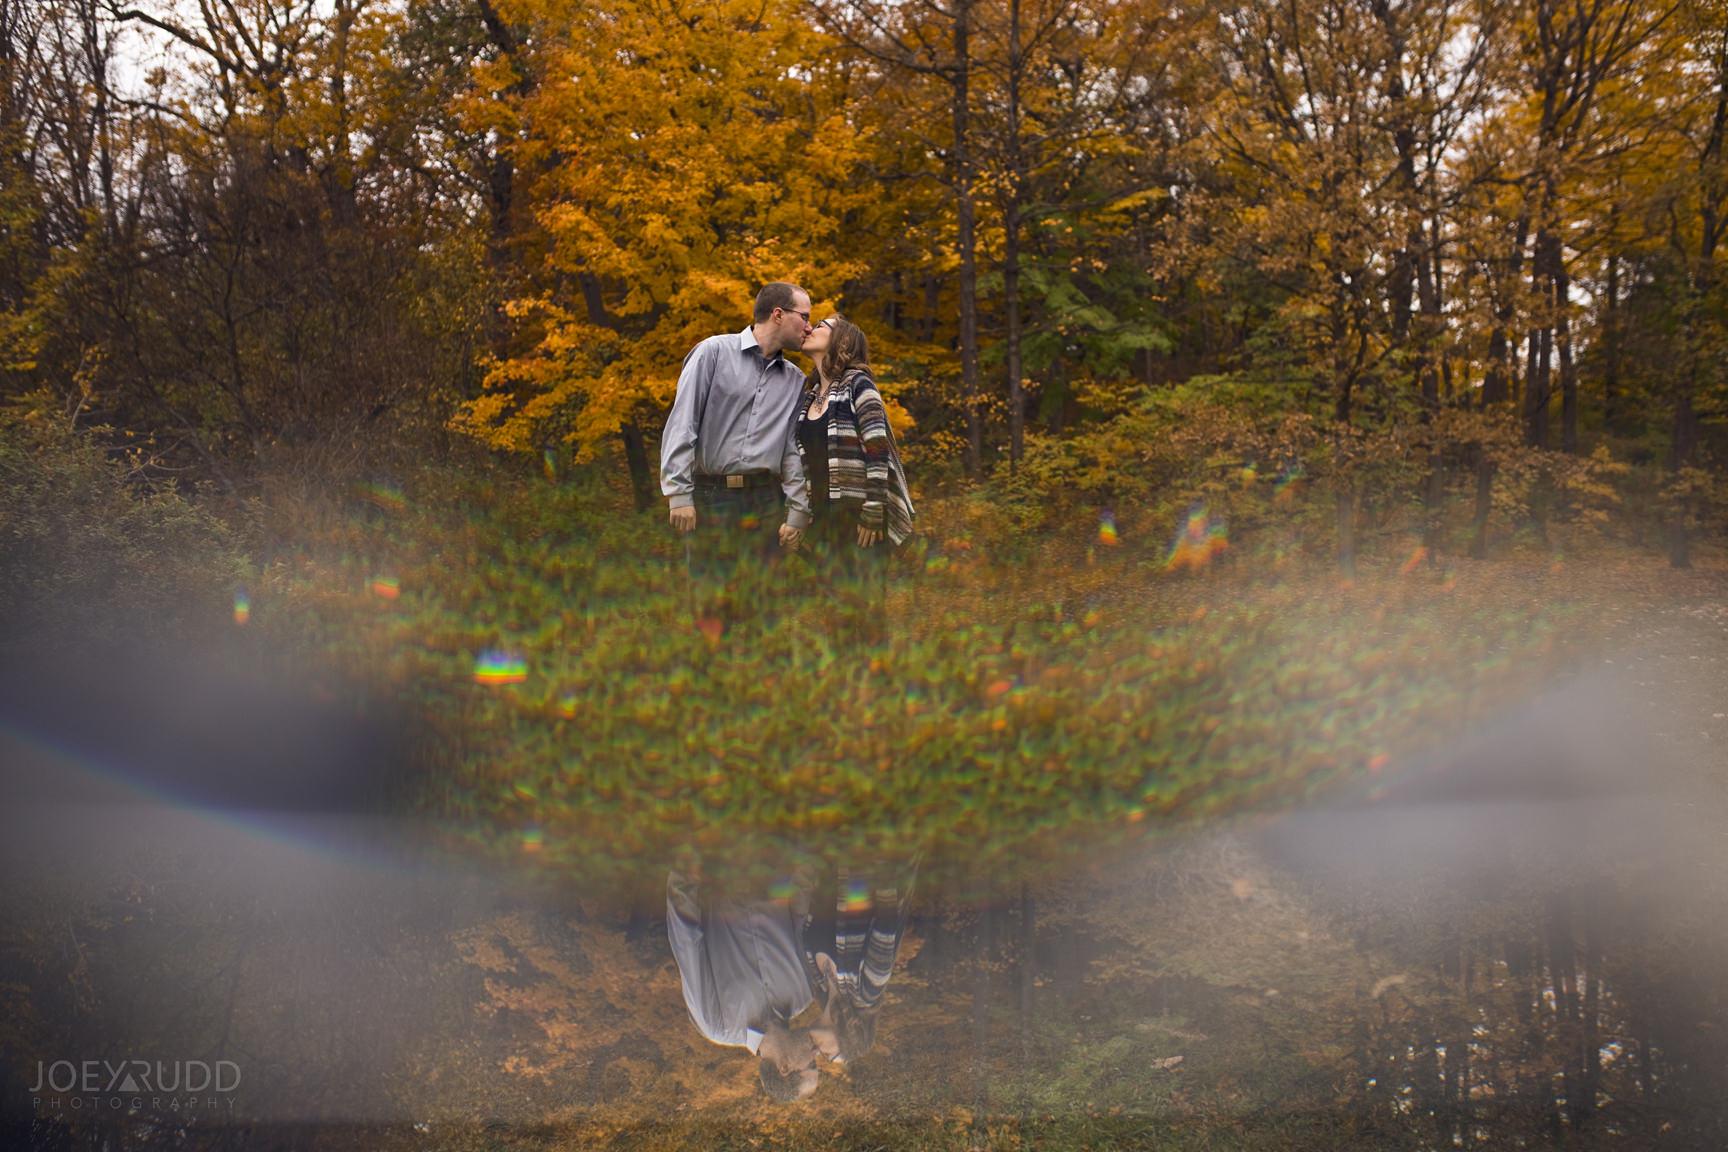 Ottawa Engagement Photo Arboretum by Ottawa Wedding Photographer Joey Rudd Photography Fall Leaves Prism Prisming